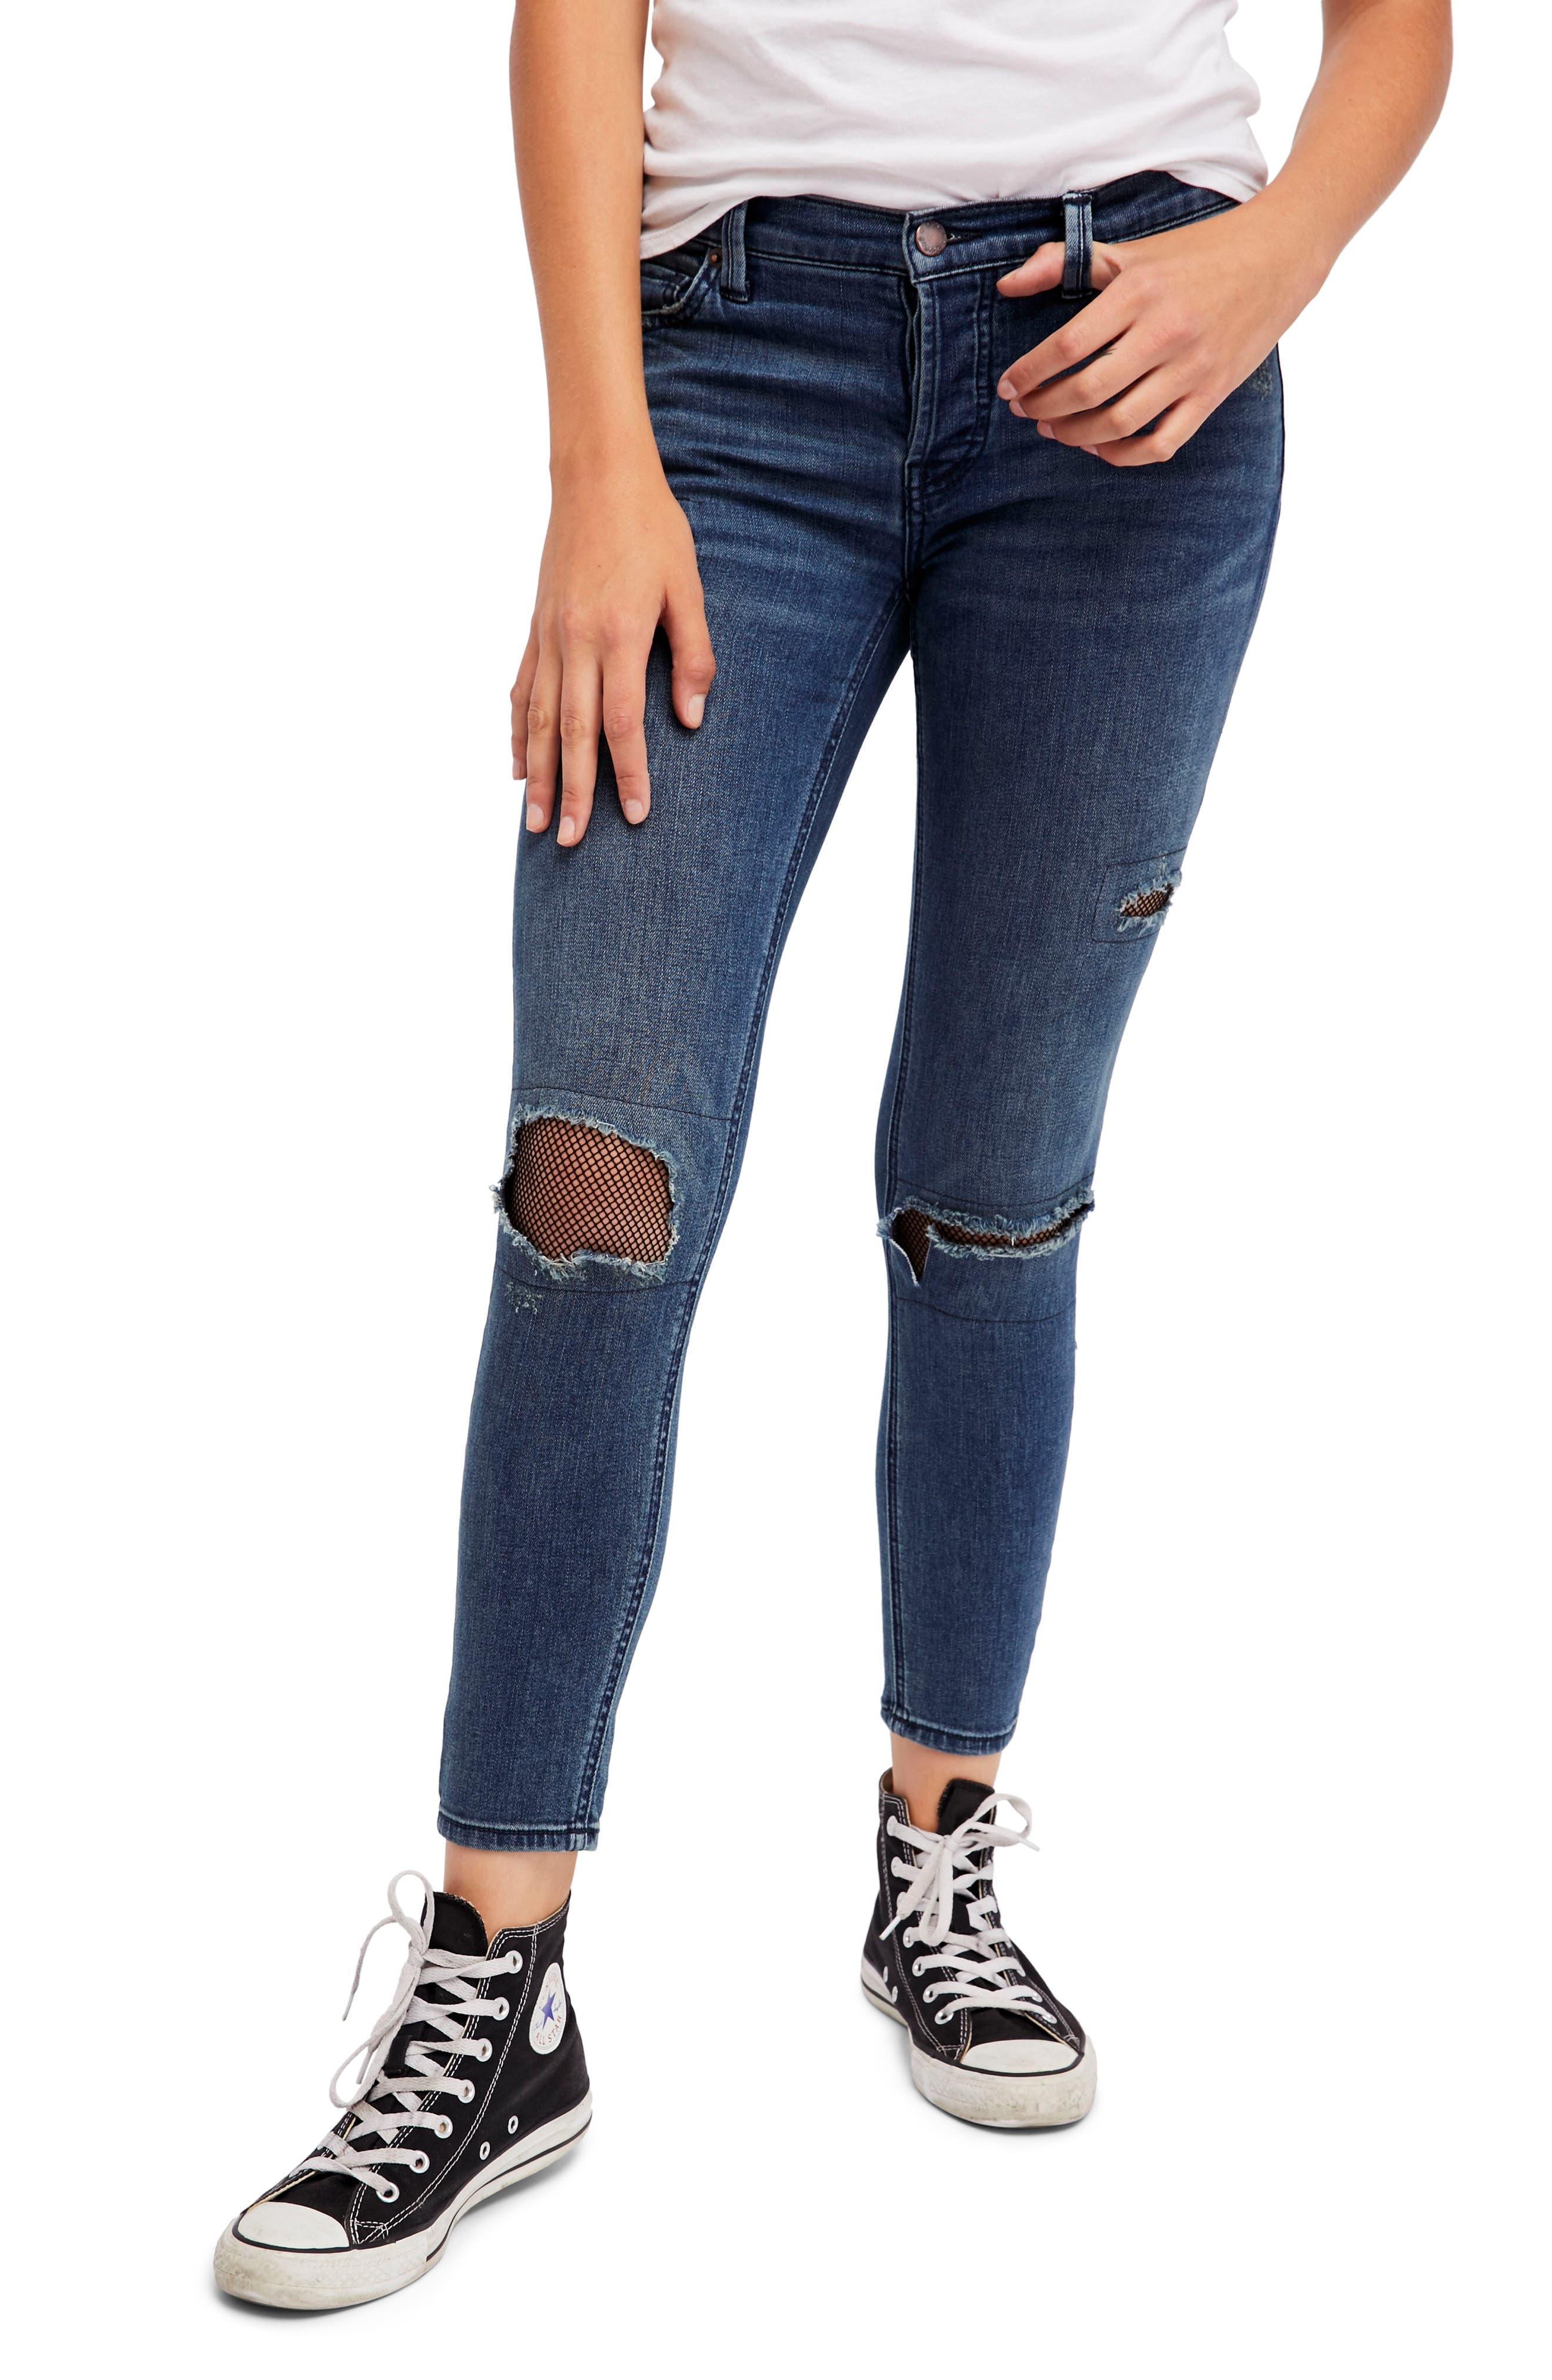 Alternate Image 1 Selected - Free People Fishnet Skinny Jeans